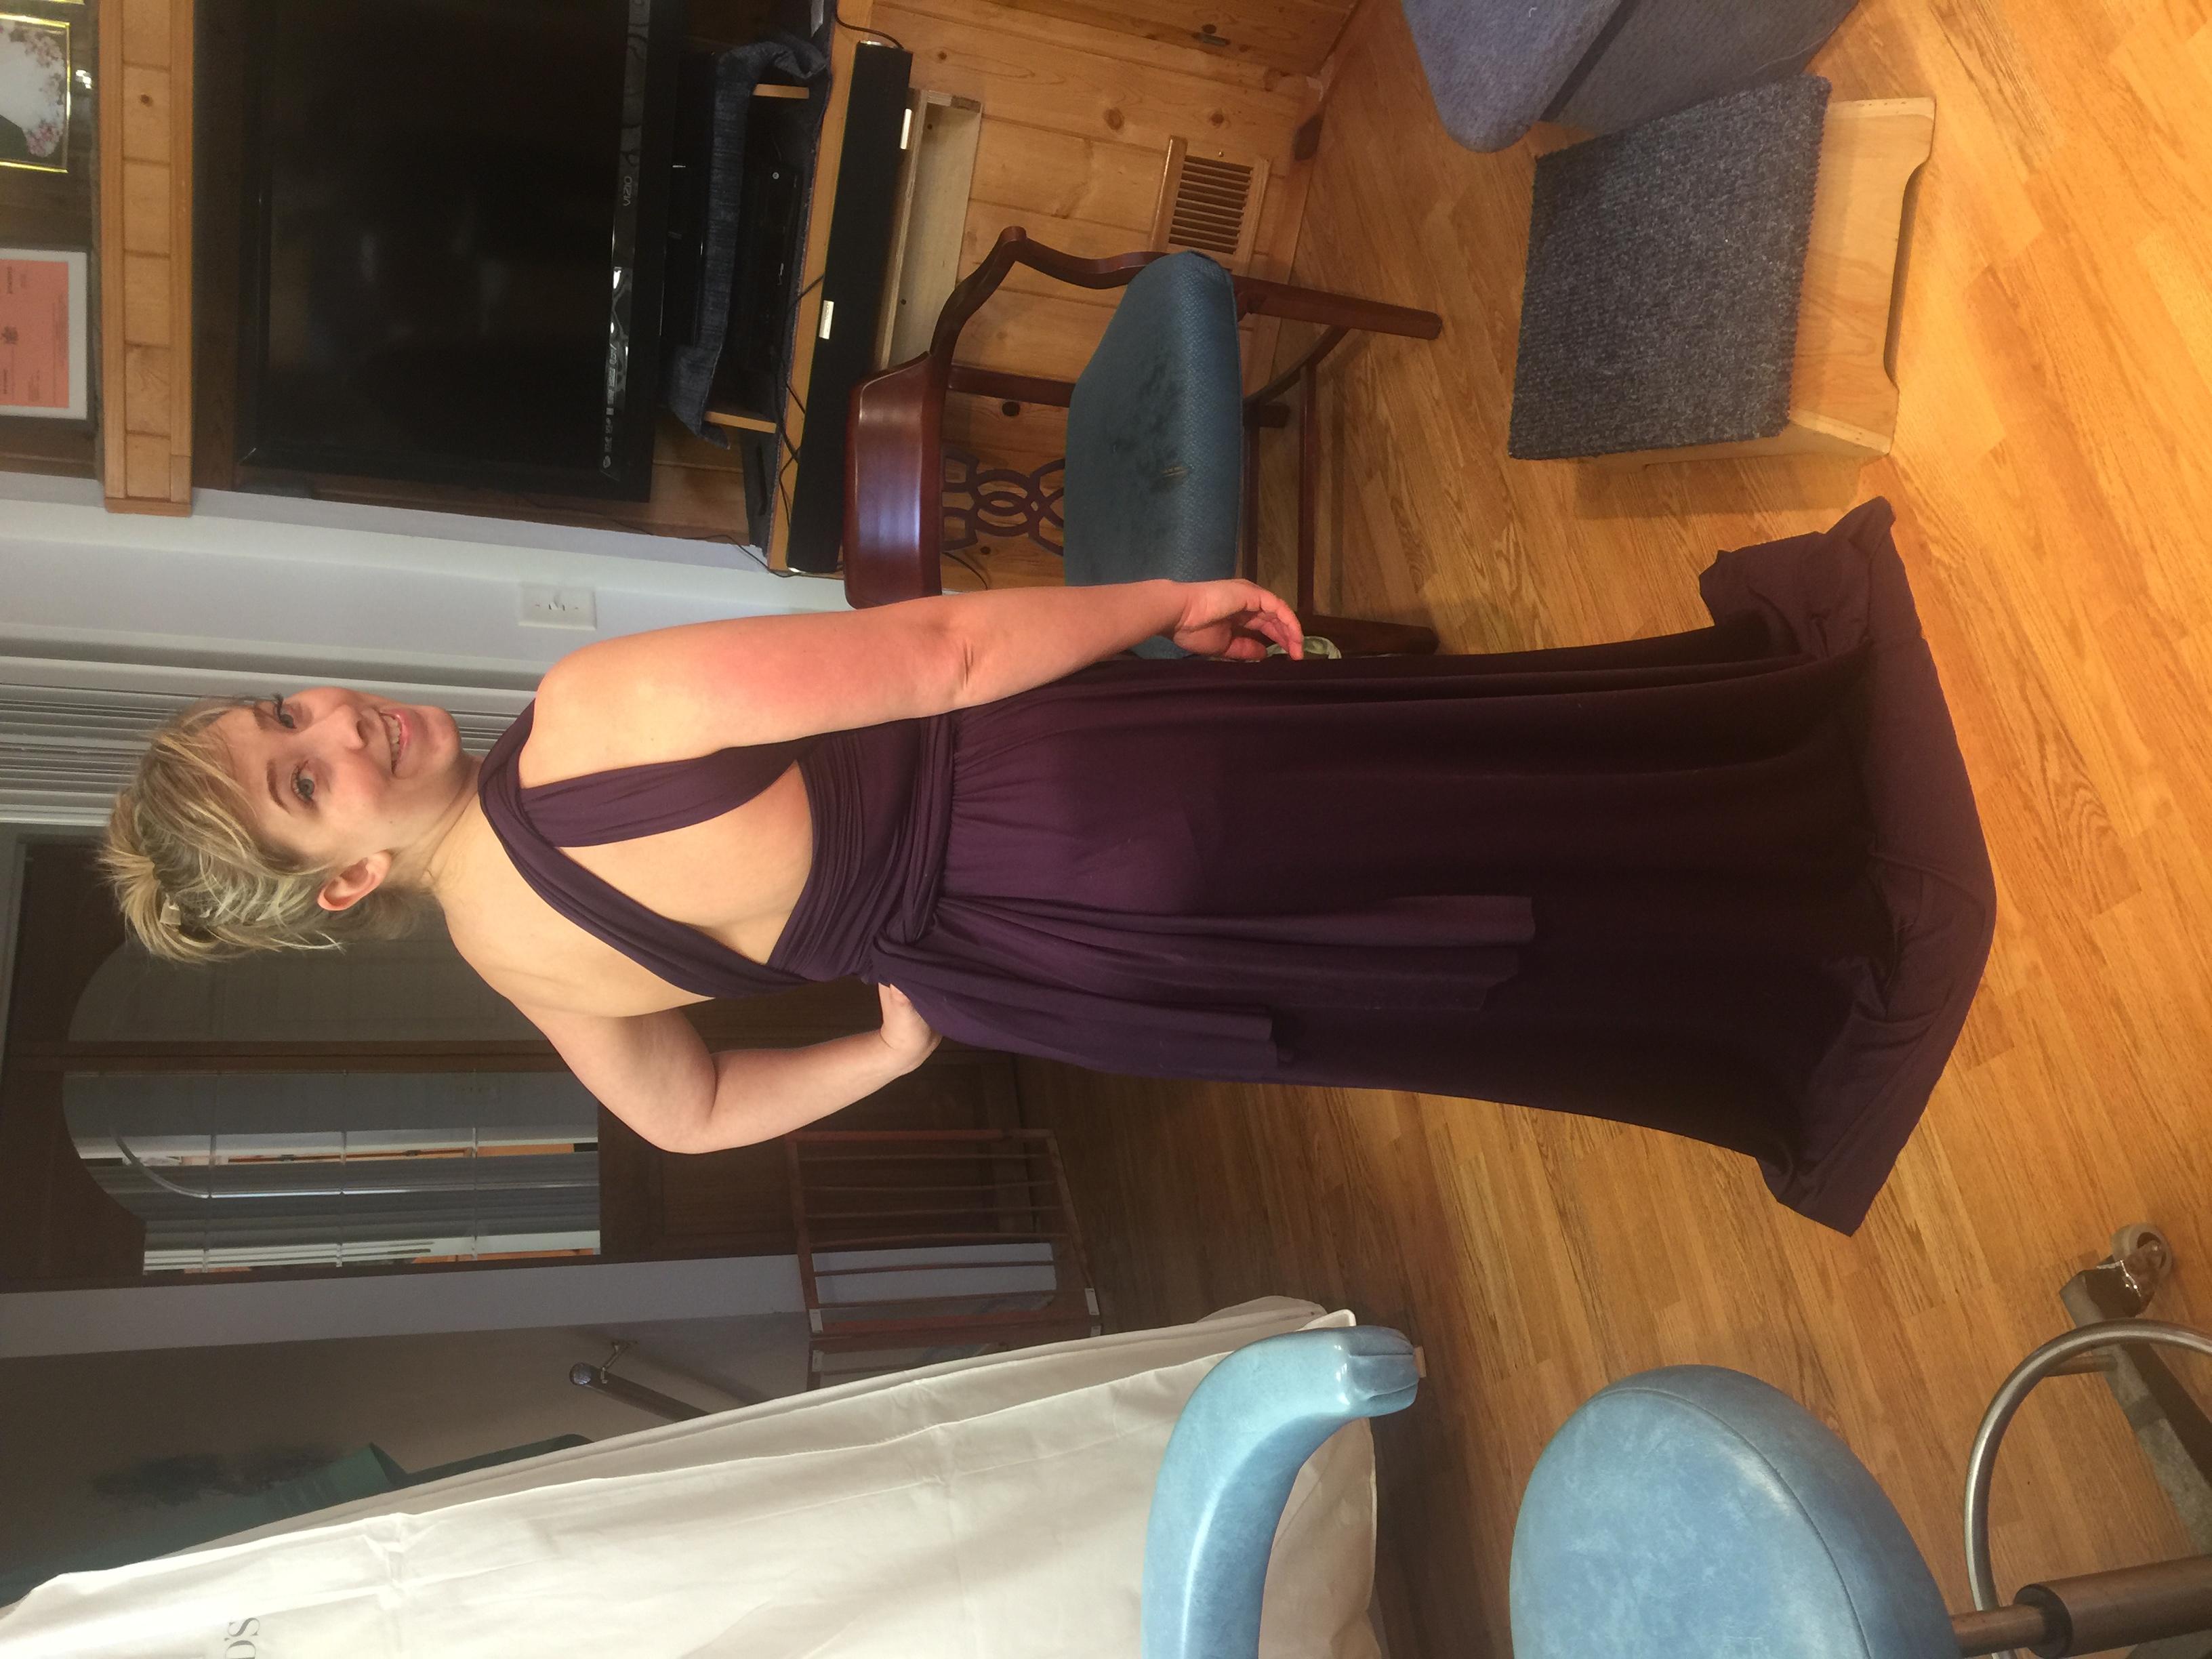 jeannie s stitchery liverpool ny 13088 yp com